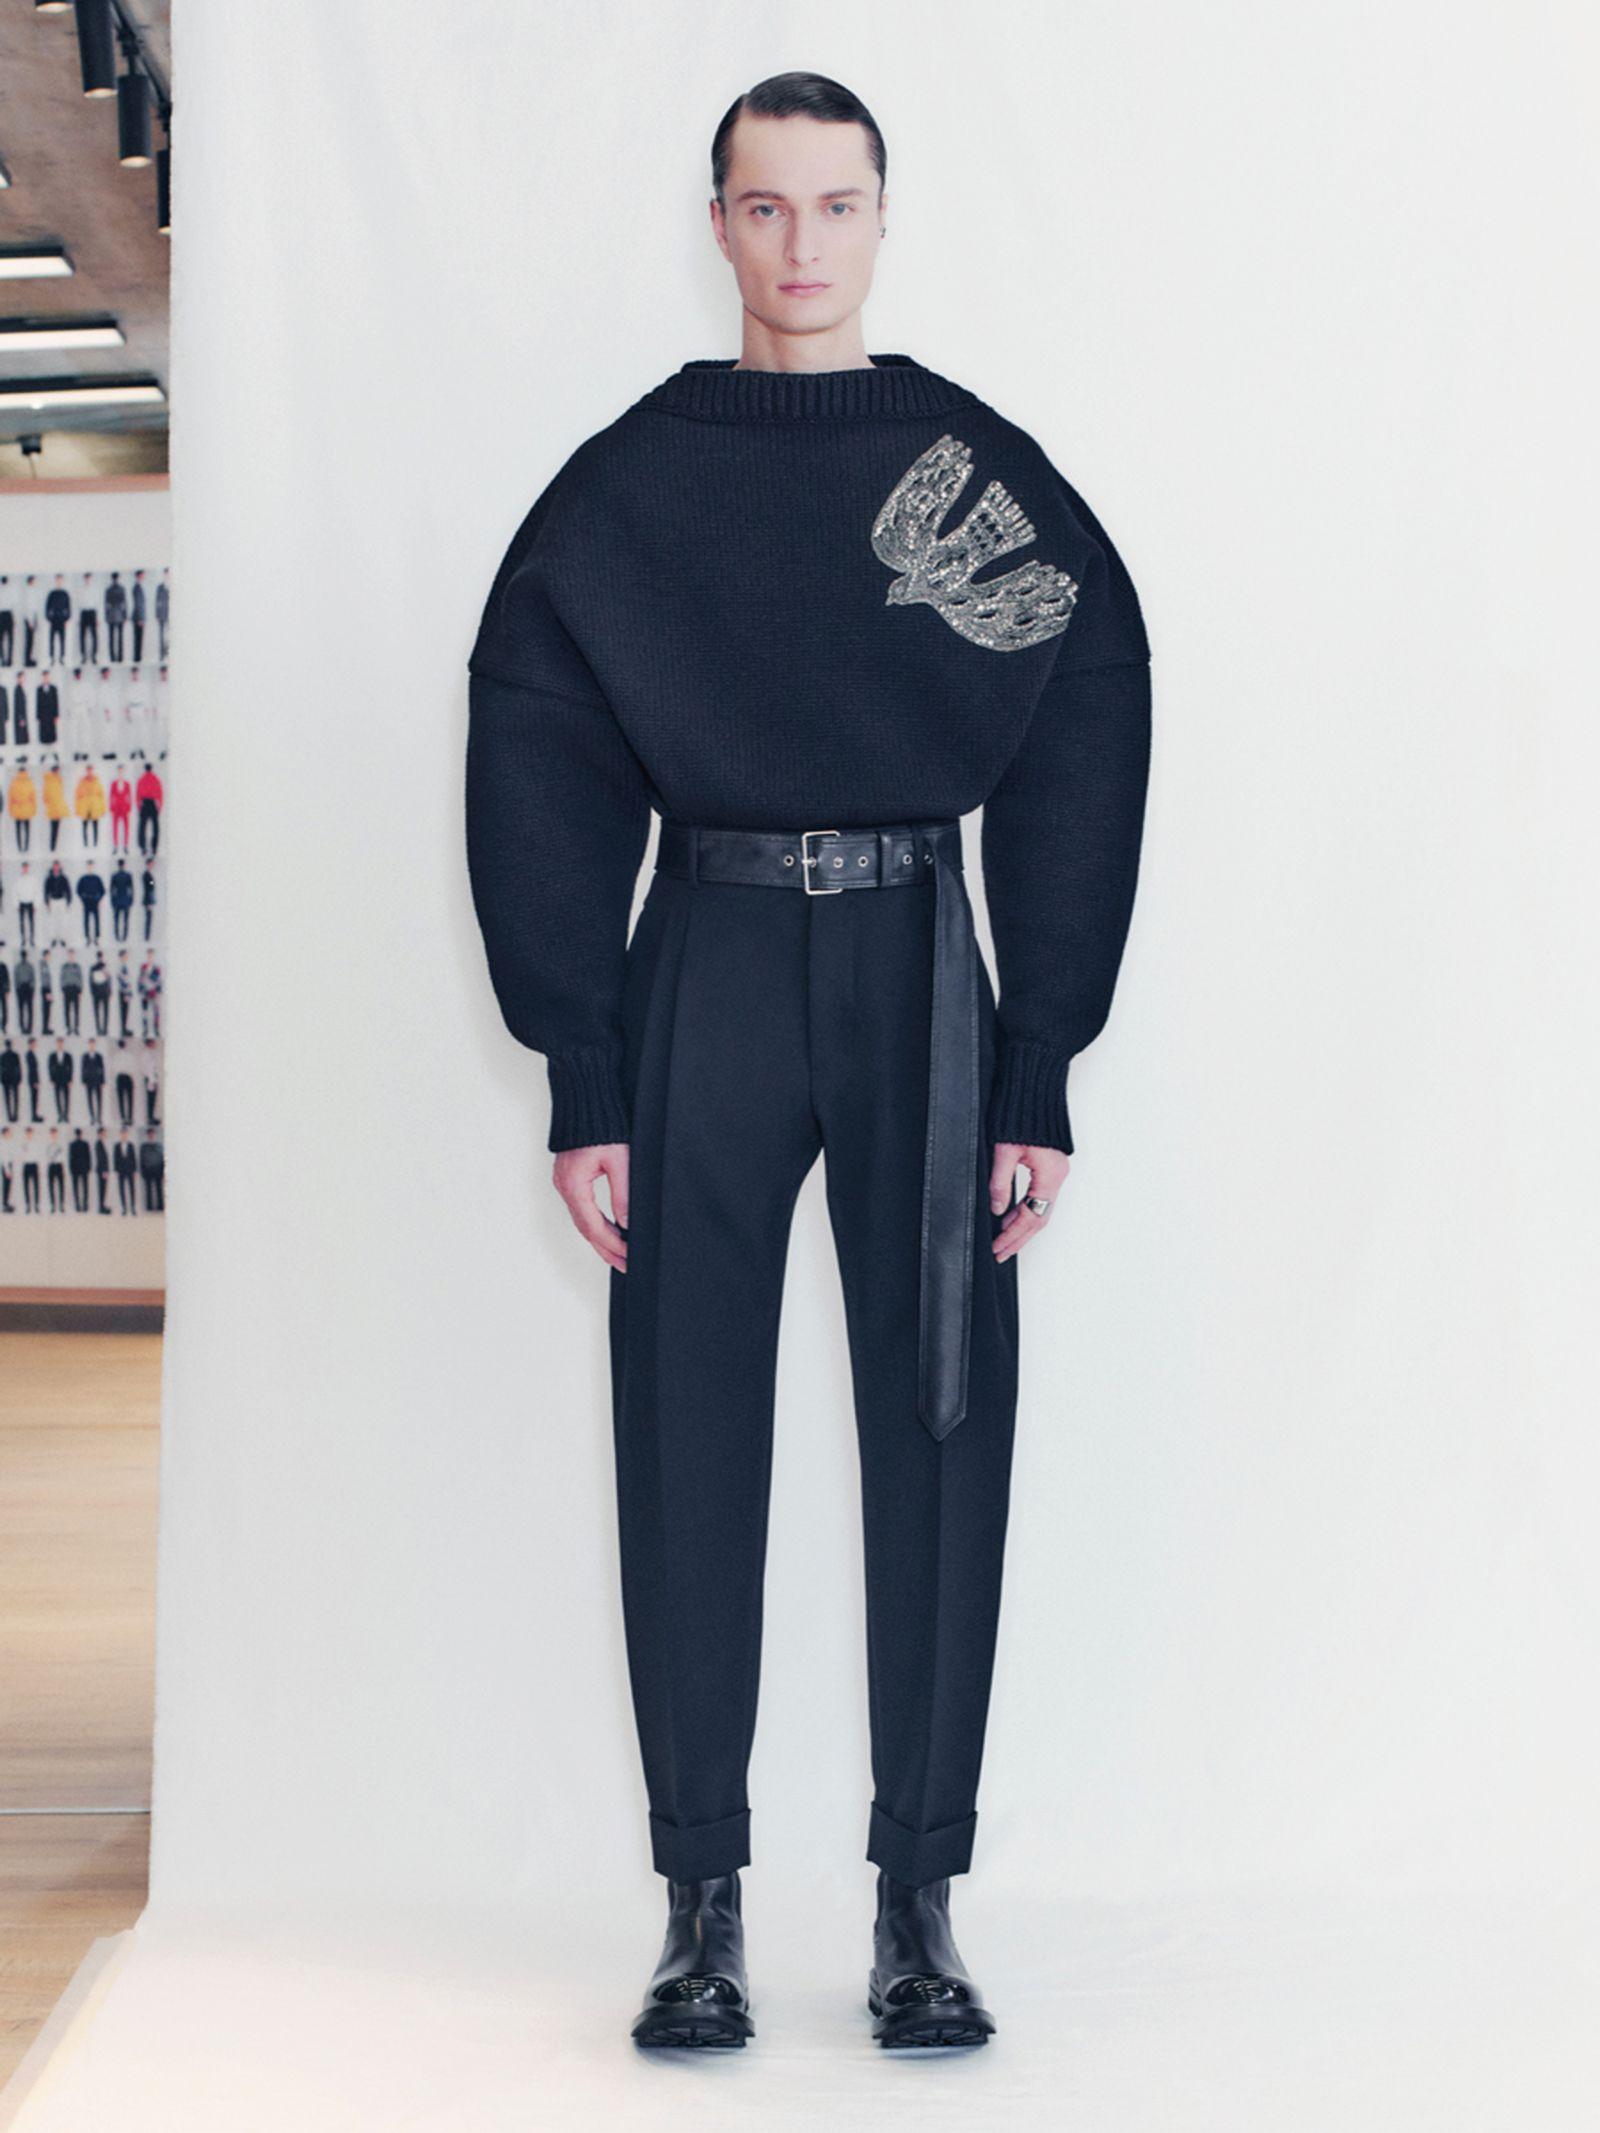 alexander-mcqueen-fall-winter-2021-collection- (24)